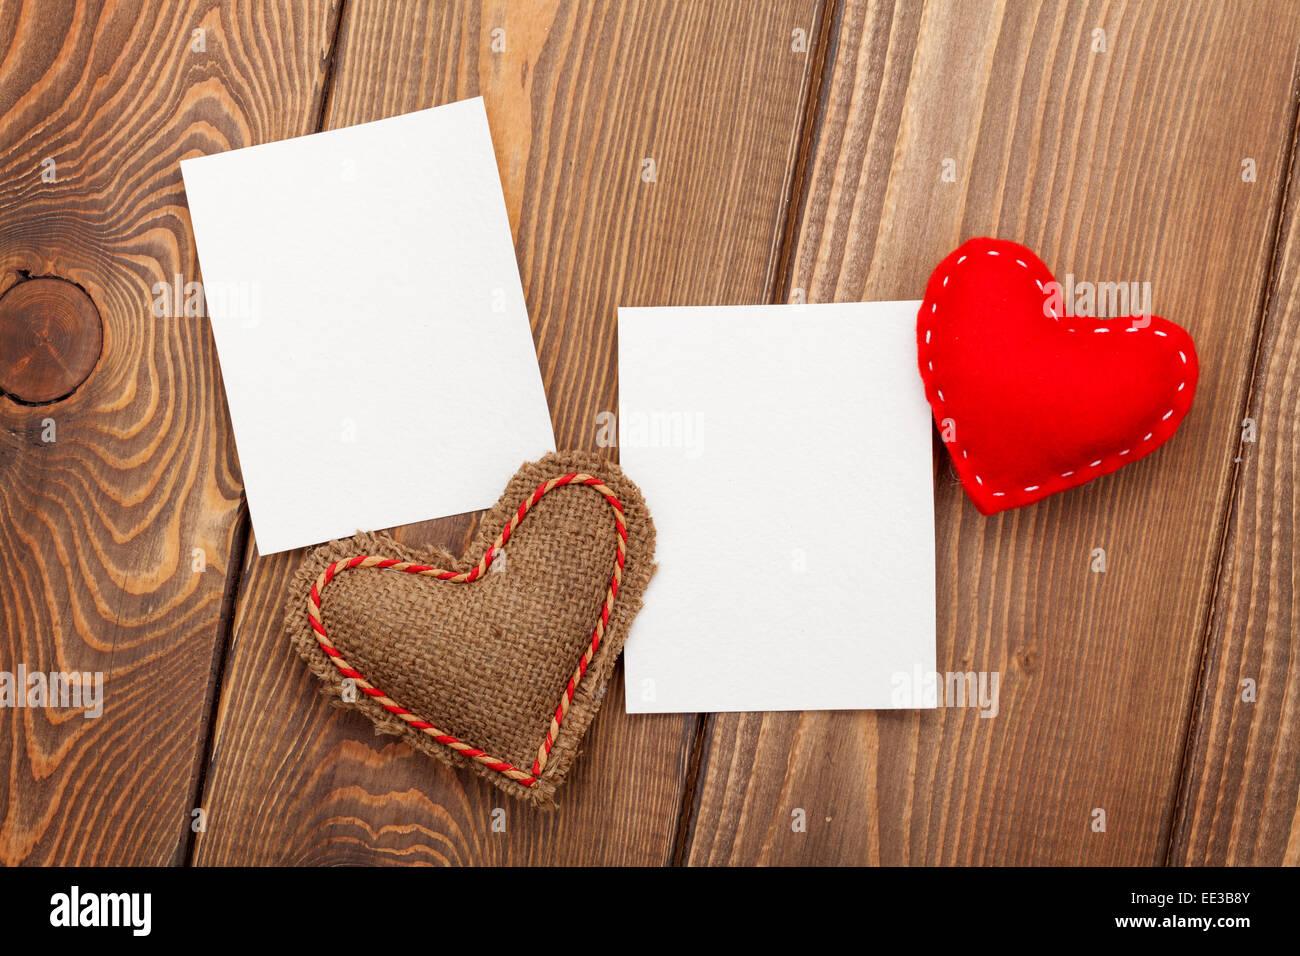 Valentines Day Photo Frames Imágenes De Stock & Valentines Day Photo ...